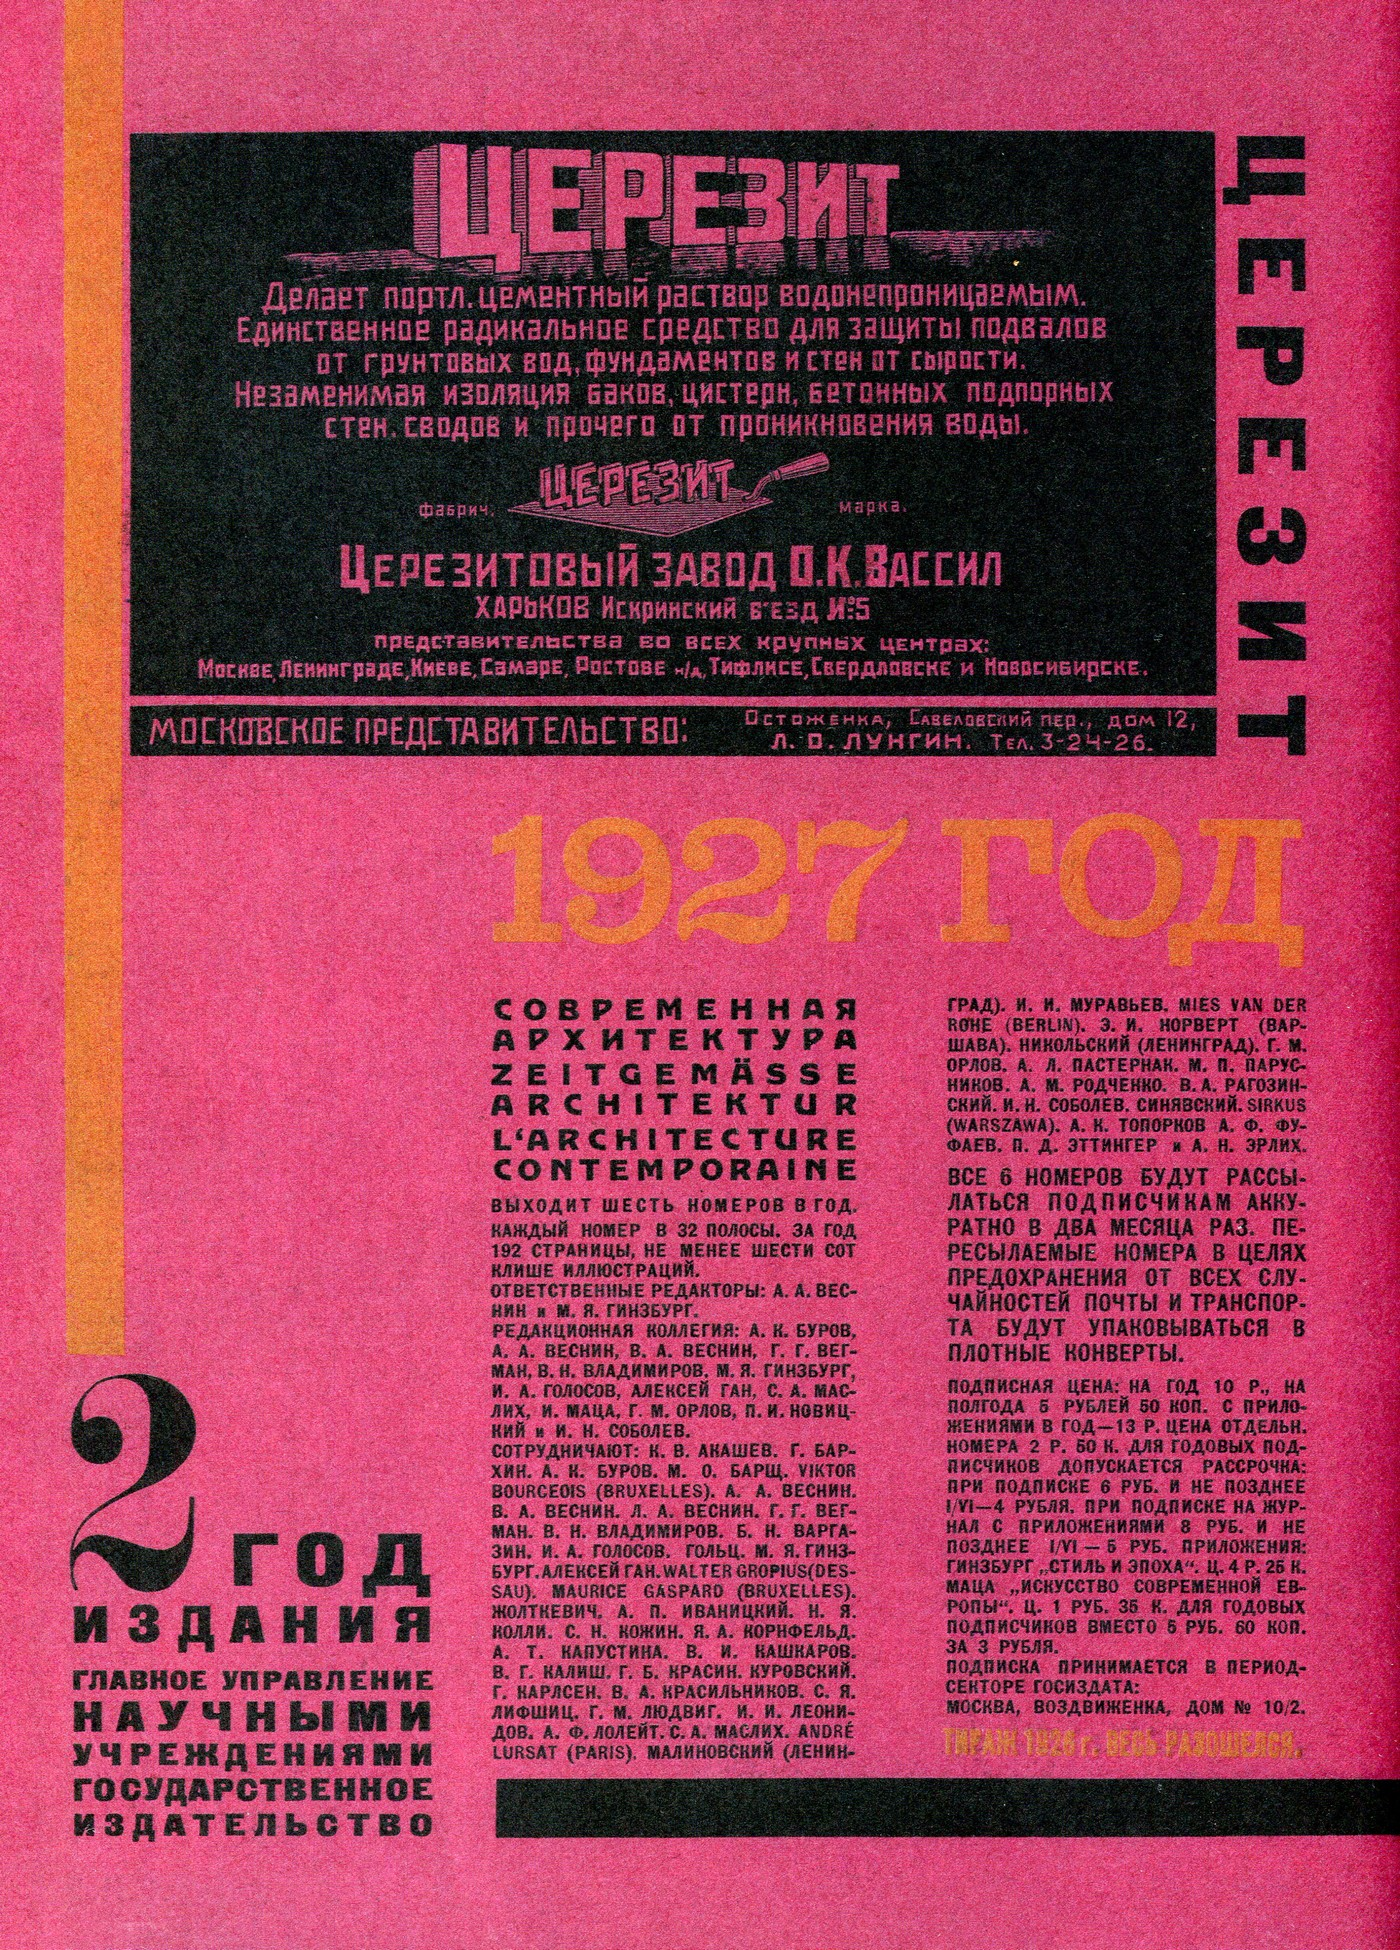 tehne.com-sa-1926-5-6-1400-0002